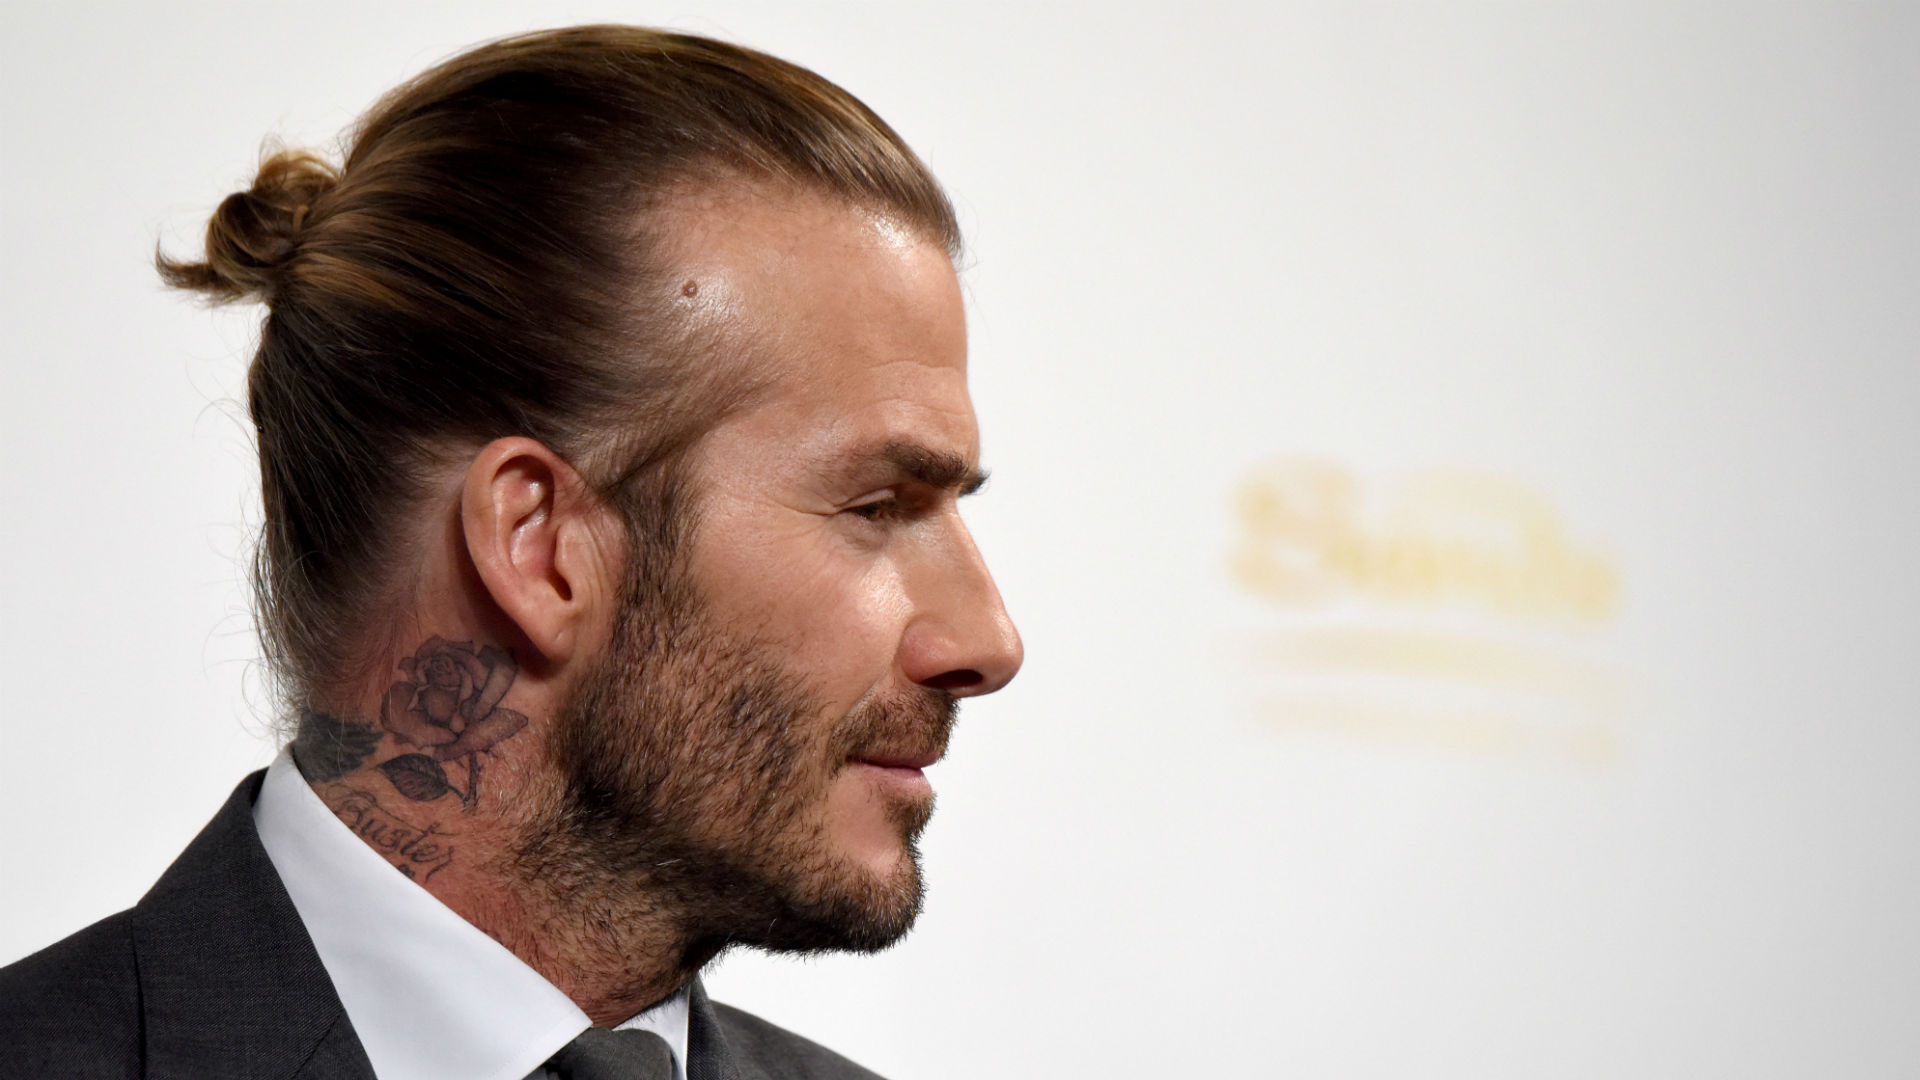 Manchester United Real Madrid Legend David Beckham Airs Heartbreak